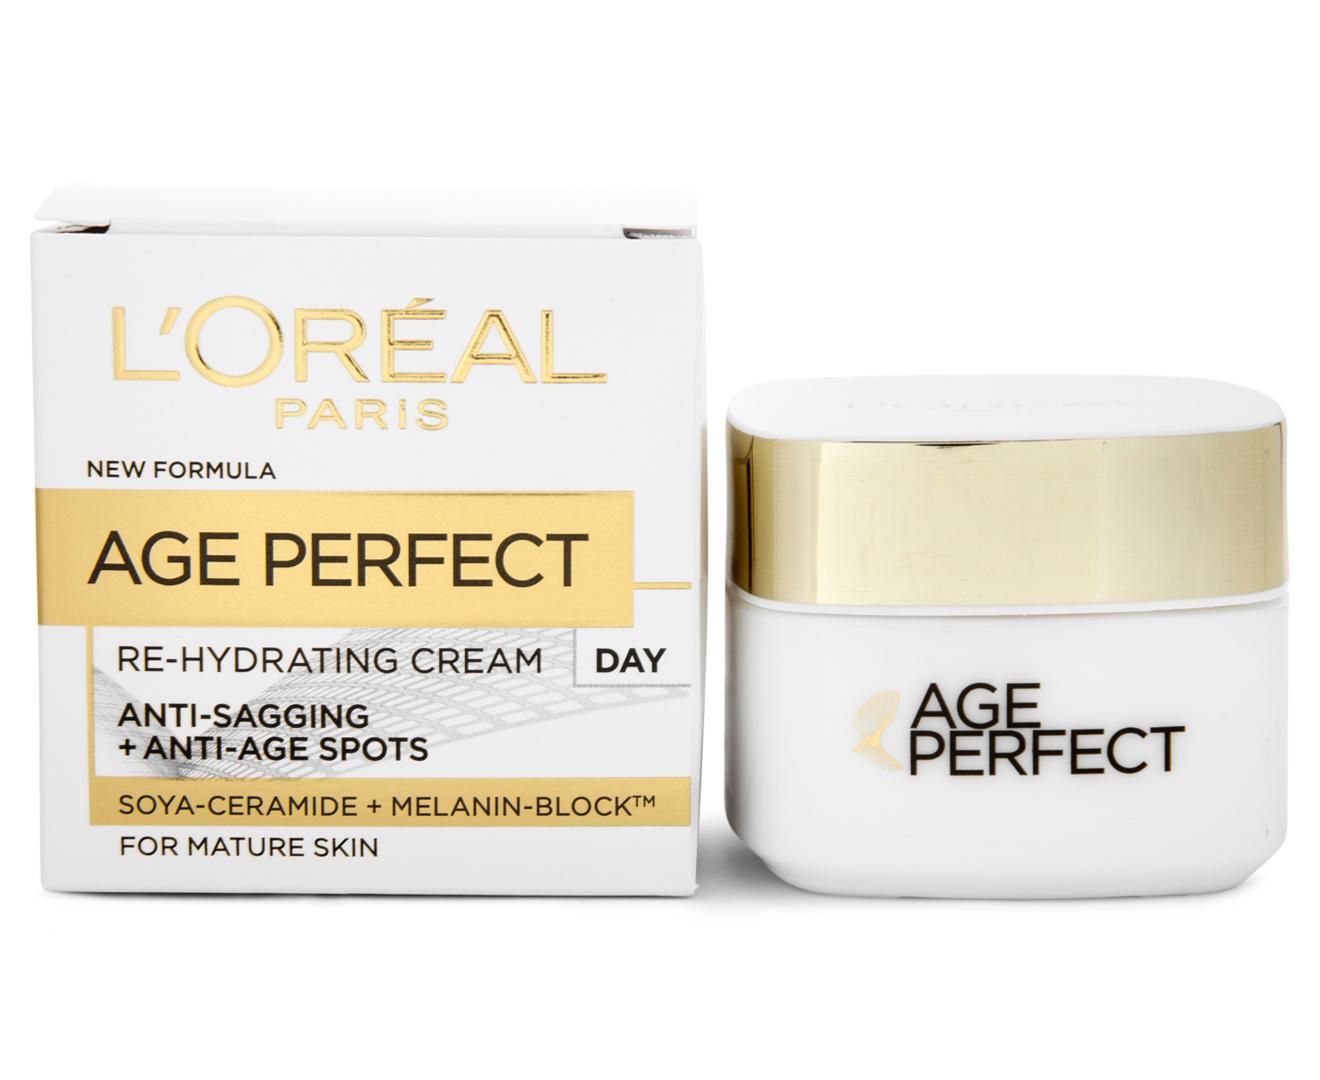 L'Oréal Age Perfect Rehydrating Day & Night Cream 50mL 5011408054392 | eBay